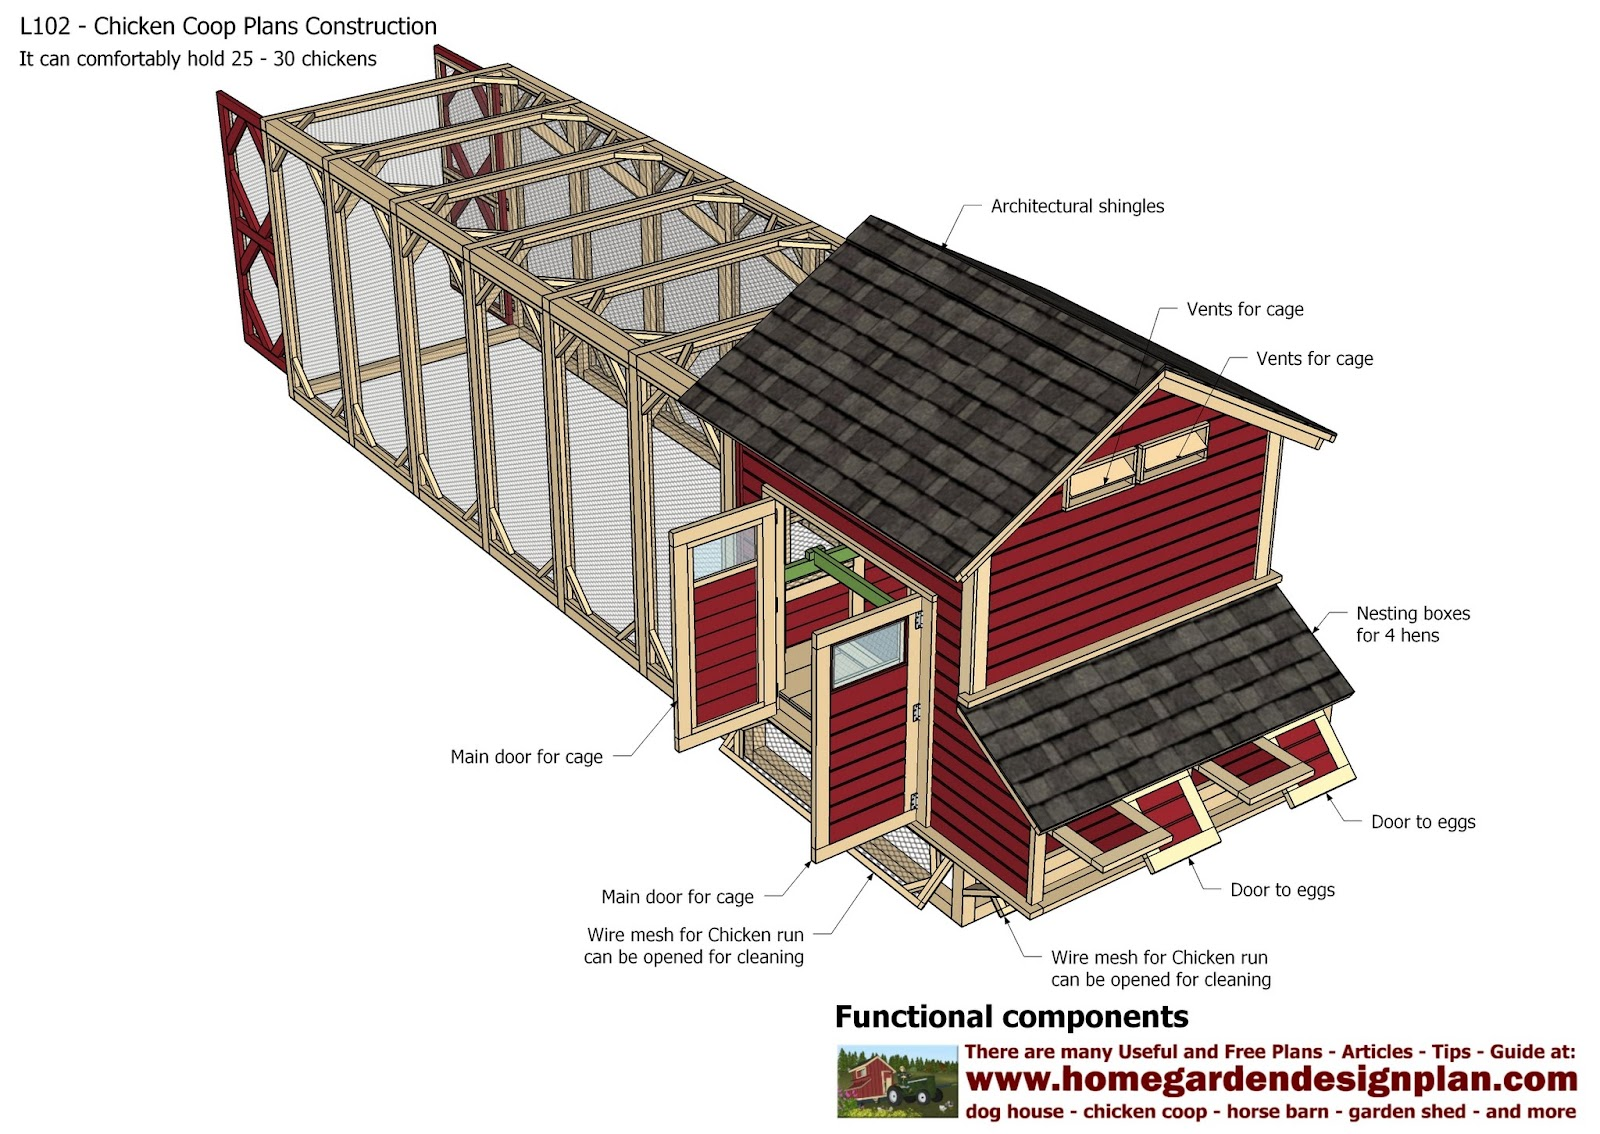 home garden plans: L102 - Chicken Coop Plans Construction ...